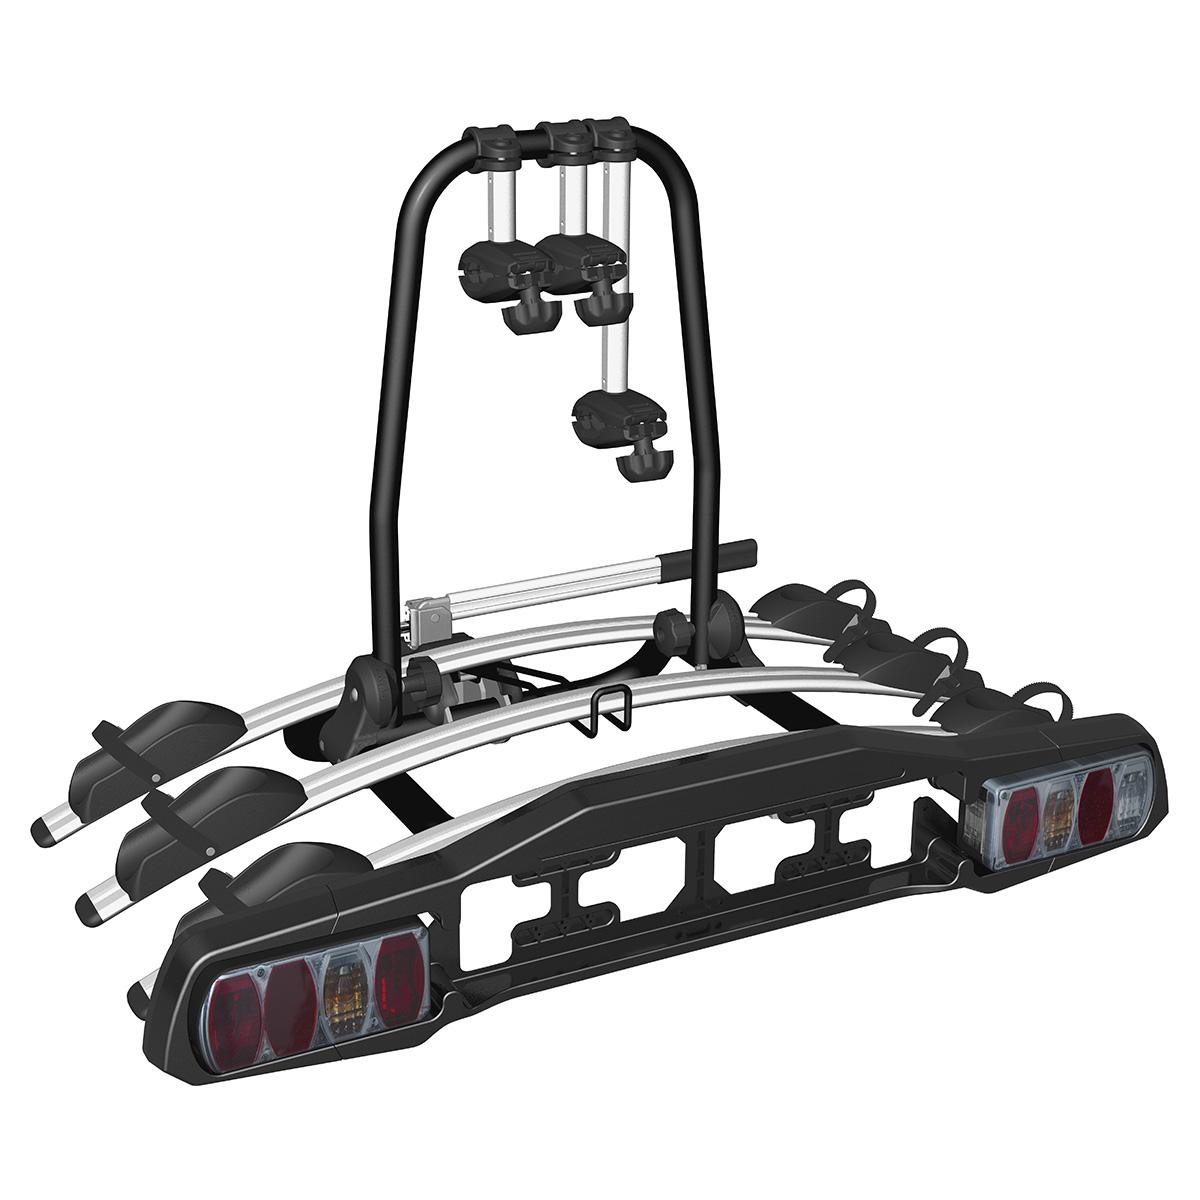 Rawlink cykelholder til 3 cykler   Car racks